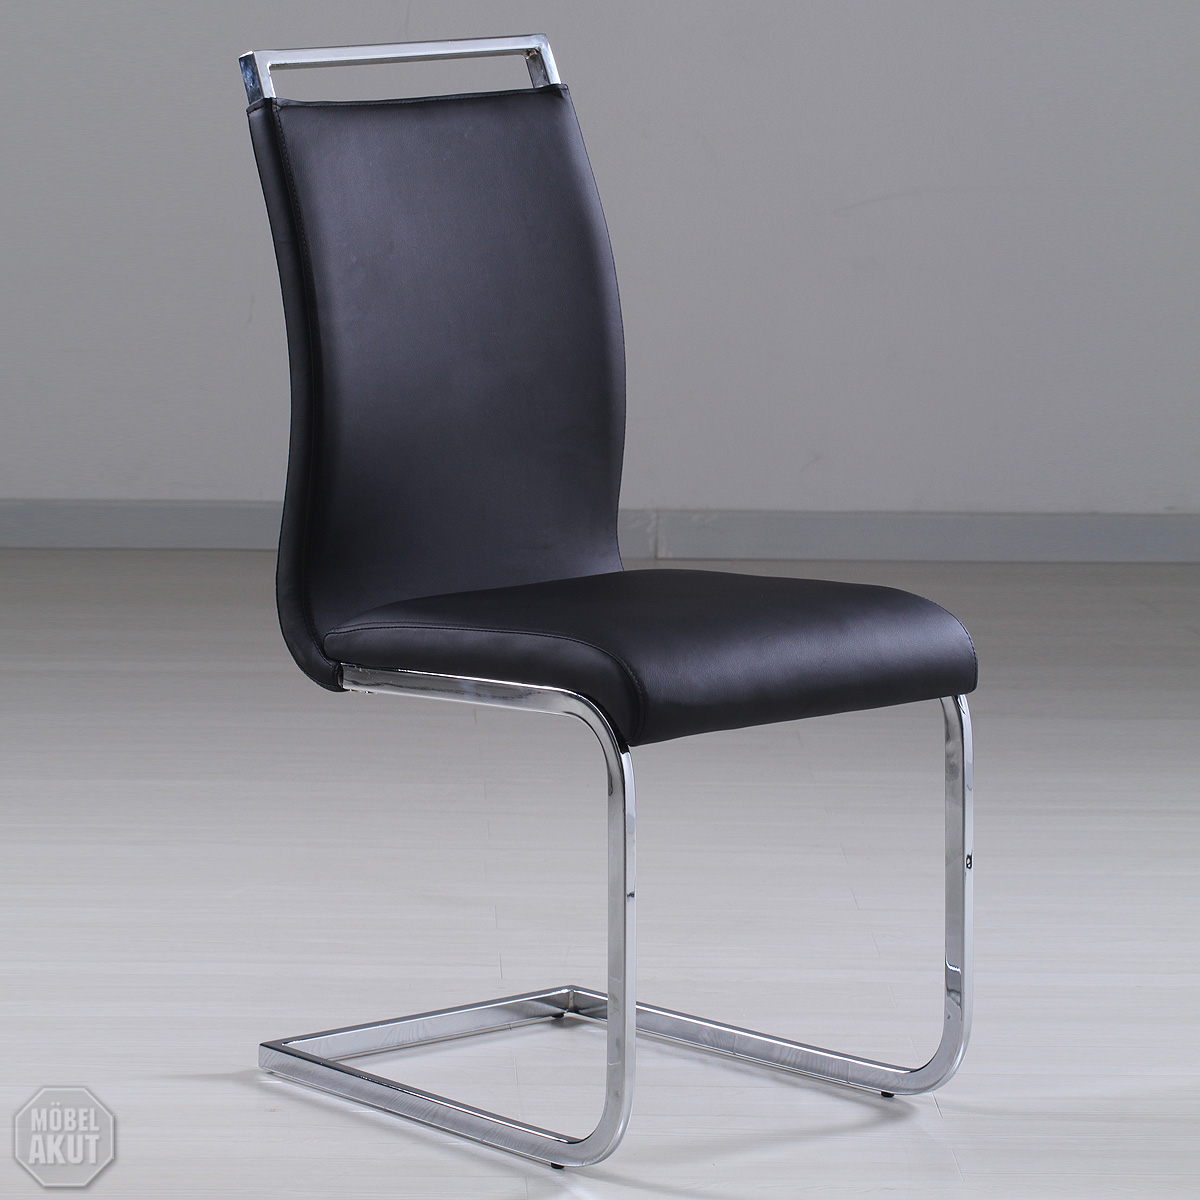 schwingstuhl vivo stuhl in schwarz freischwinger ebay. Black Bedroom Furniture Sets. Home Design Ideas